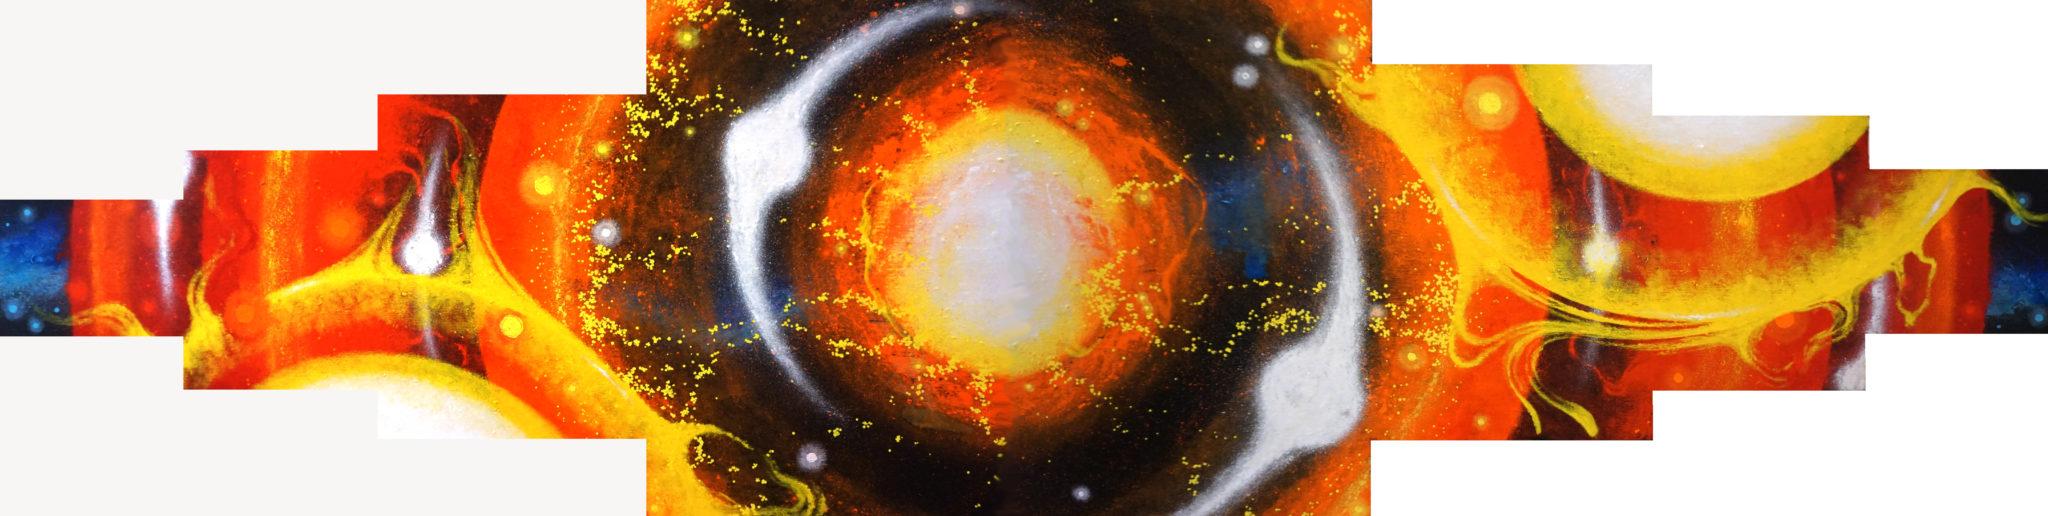 helmut eppich Inferno painting